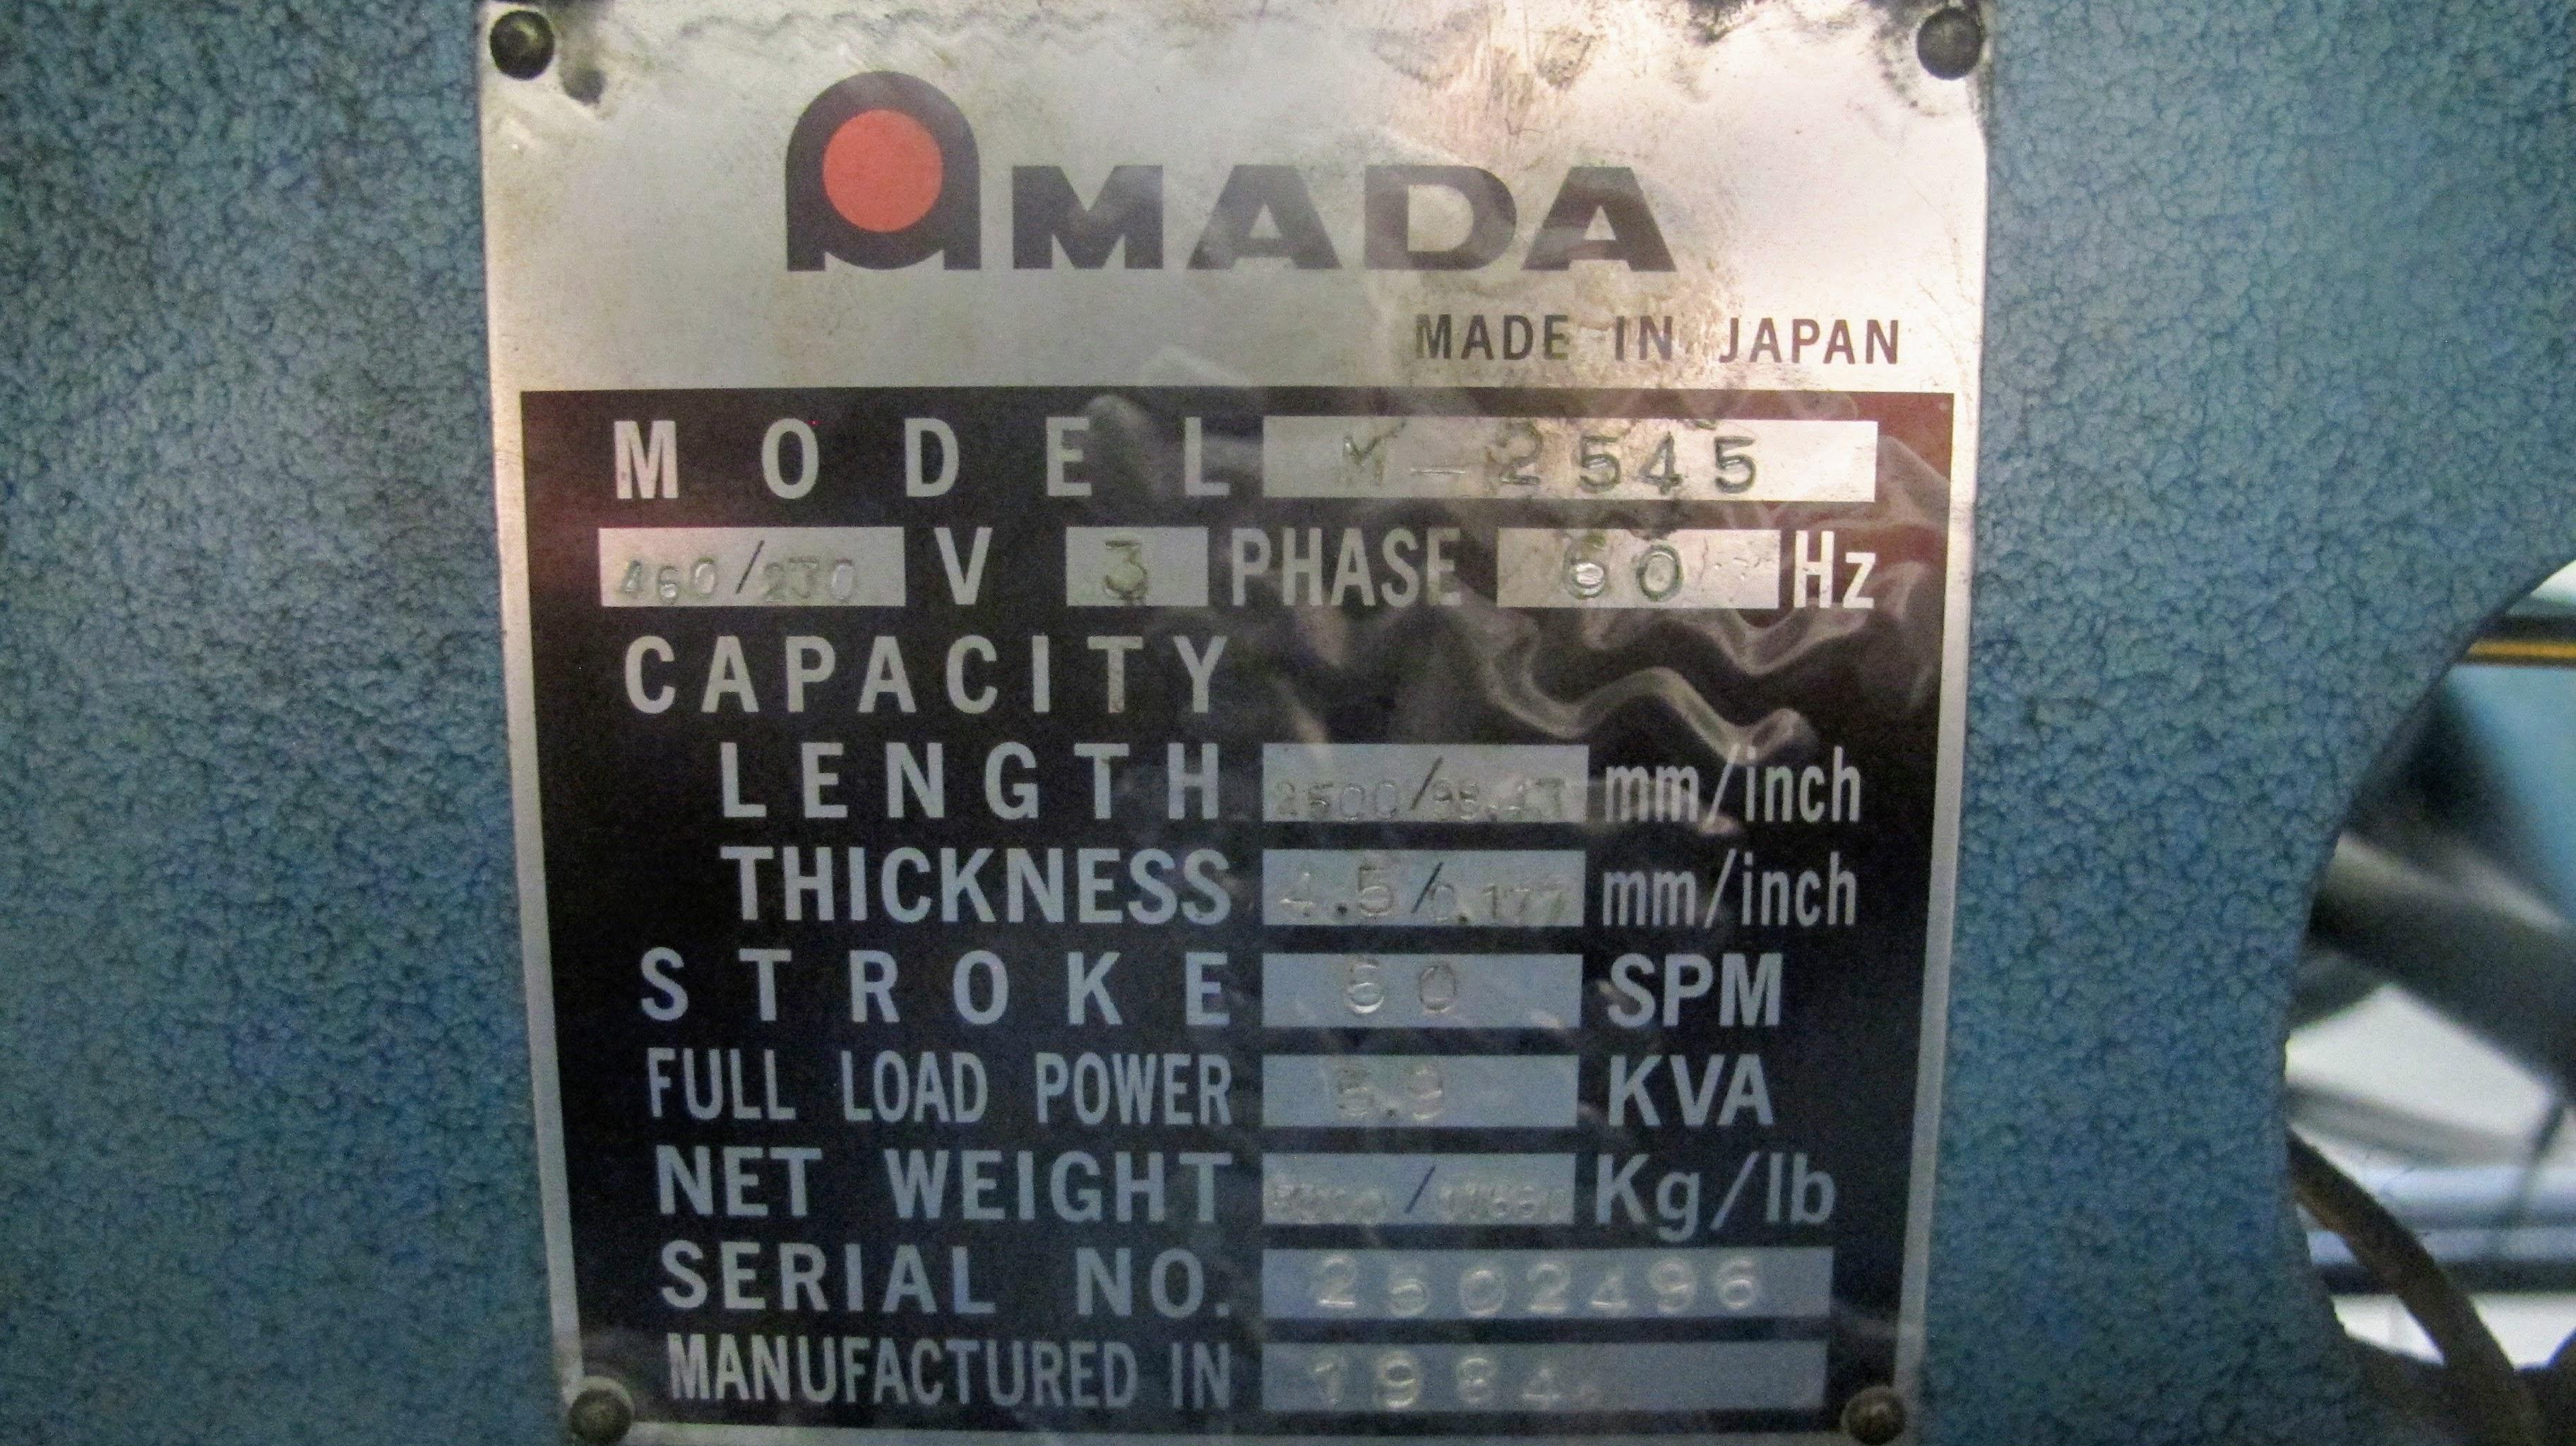 "AMADA M-2545 POWER SHEAR, 3/16"" X 96"" CAP., 60 SPM, S/N 2502496, 3 PHASE, 5.9KVA FULL LOAD - Image 5 of 7"